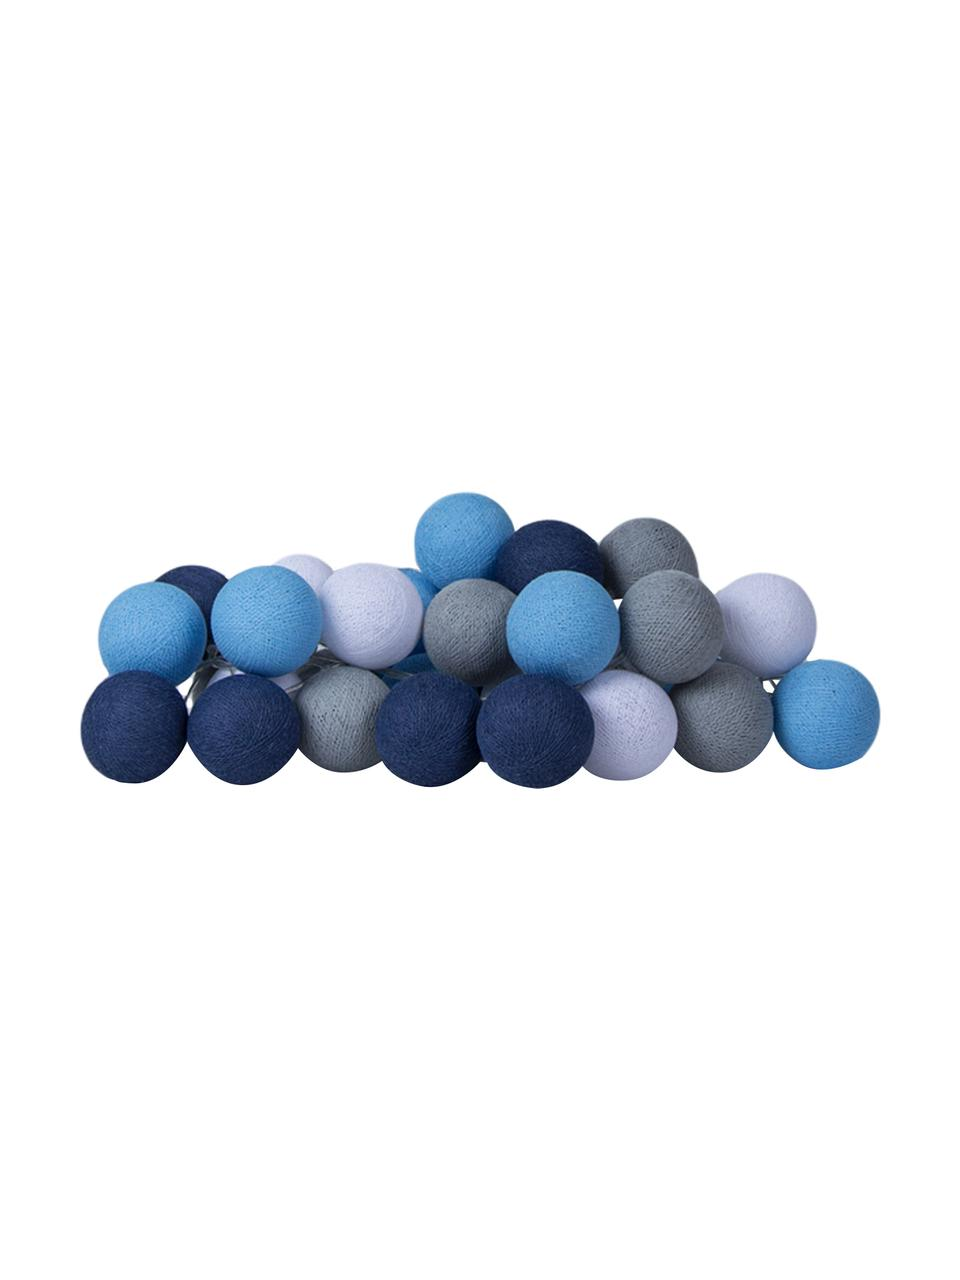 LED Lichterkette Colorain, Lampions: Polyester, Blautöne, Grau, Weiß, L 264 cm